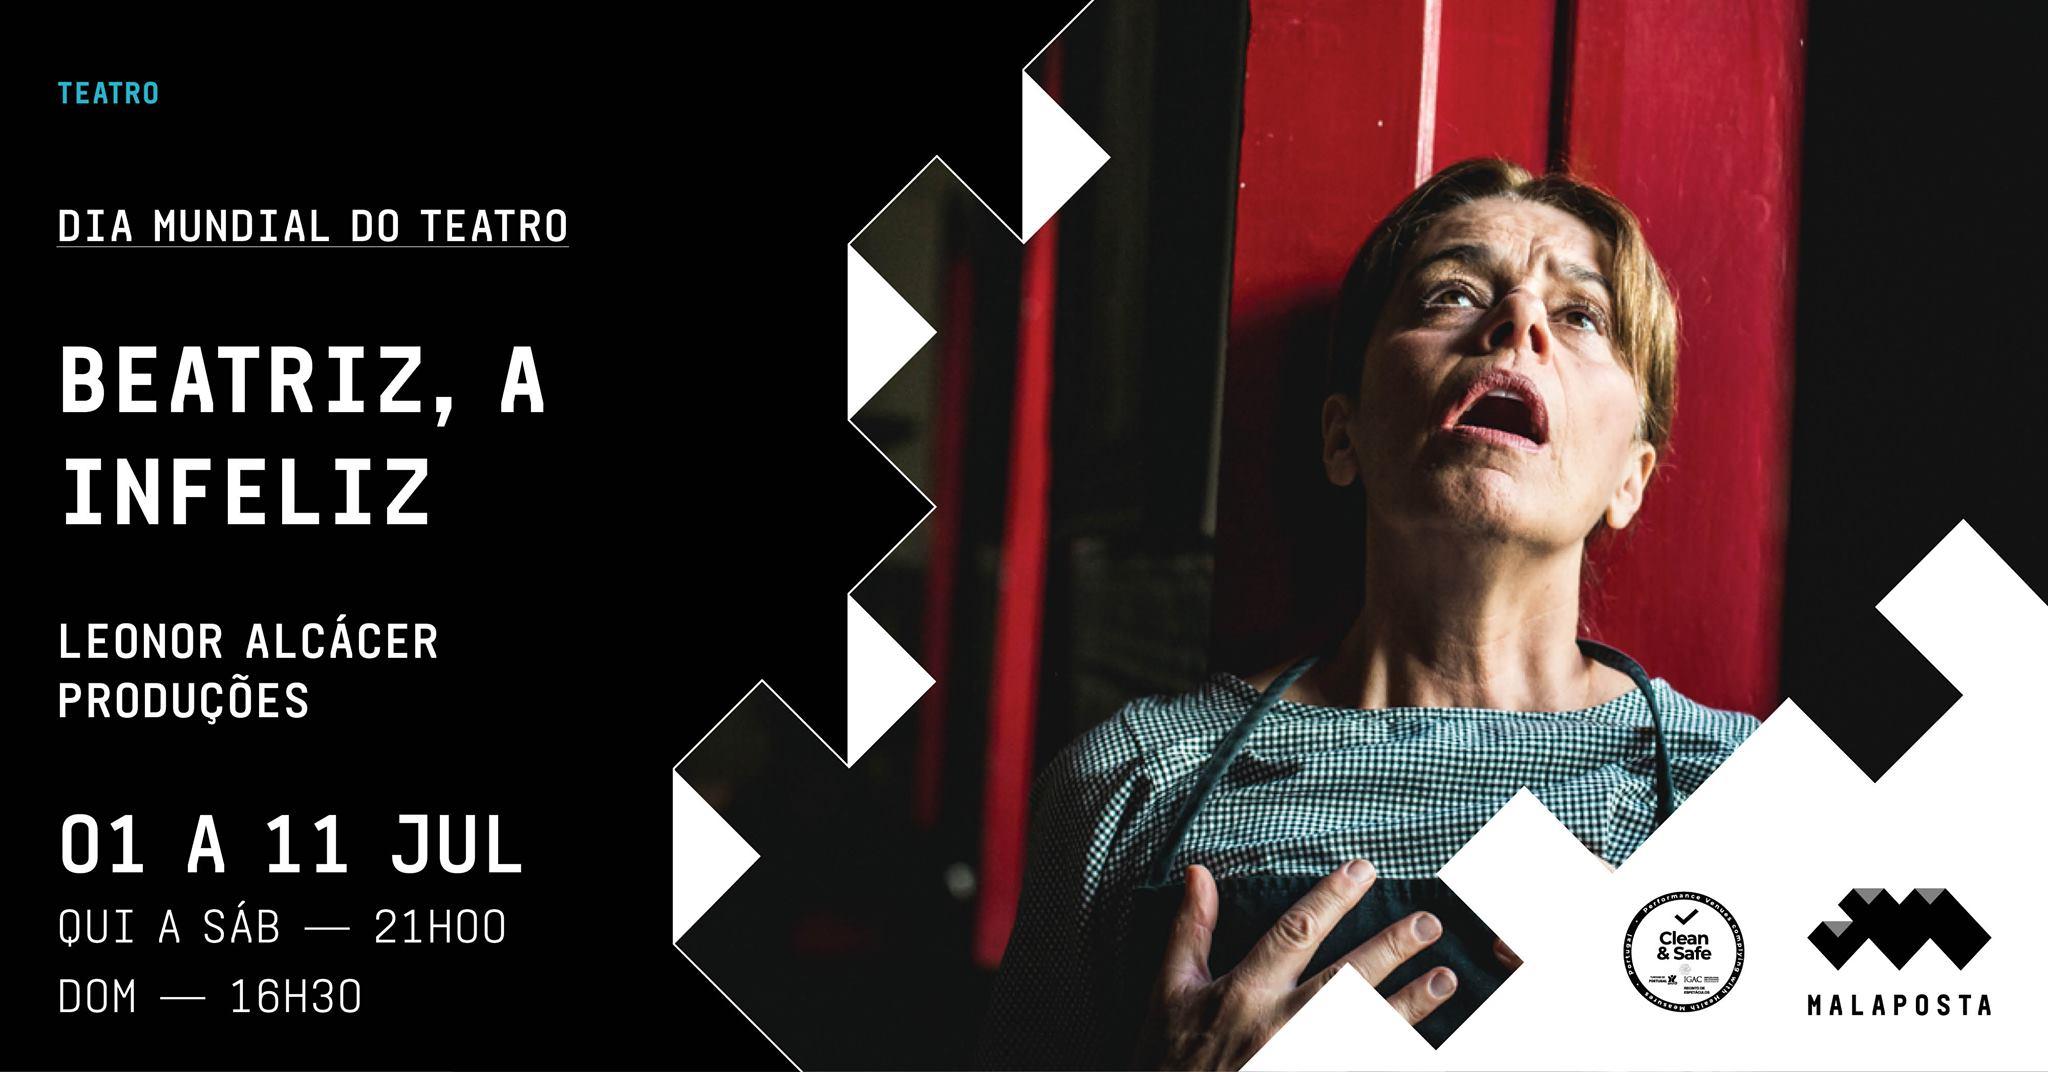 Teatro  'BEATRIZ, A INFELIZ'